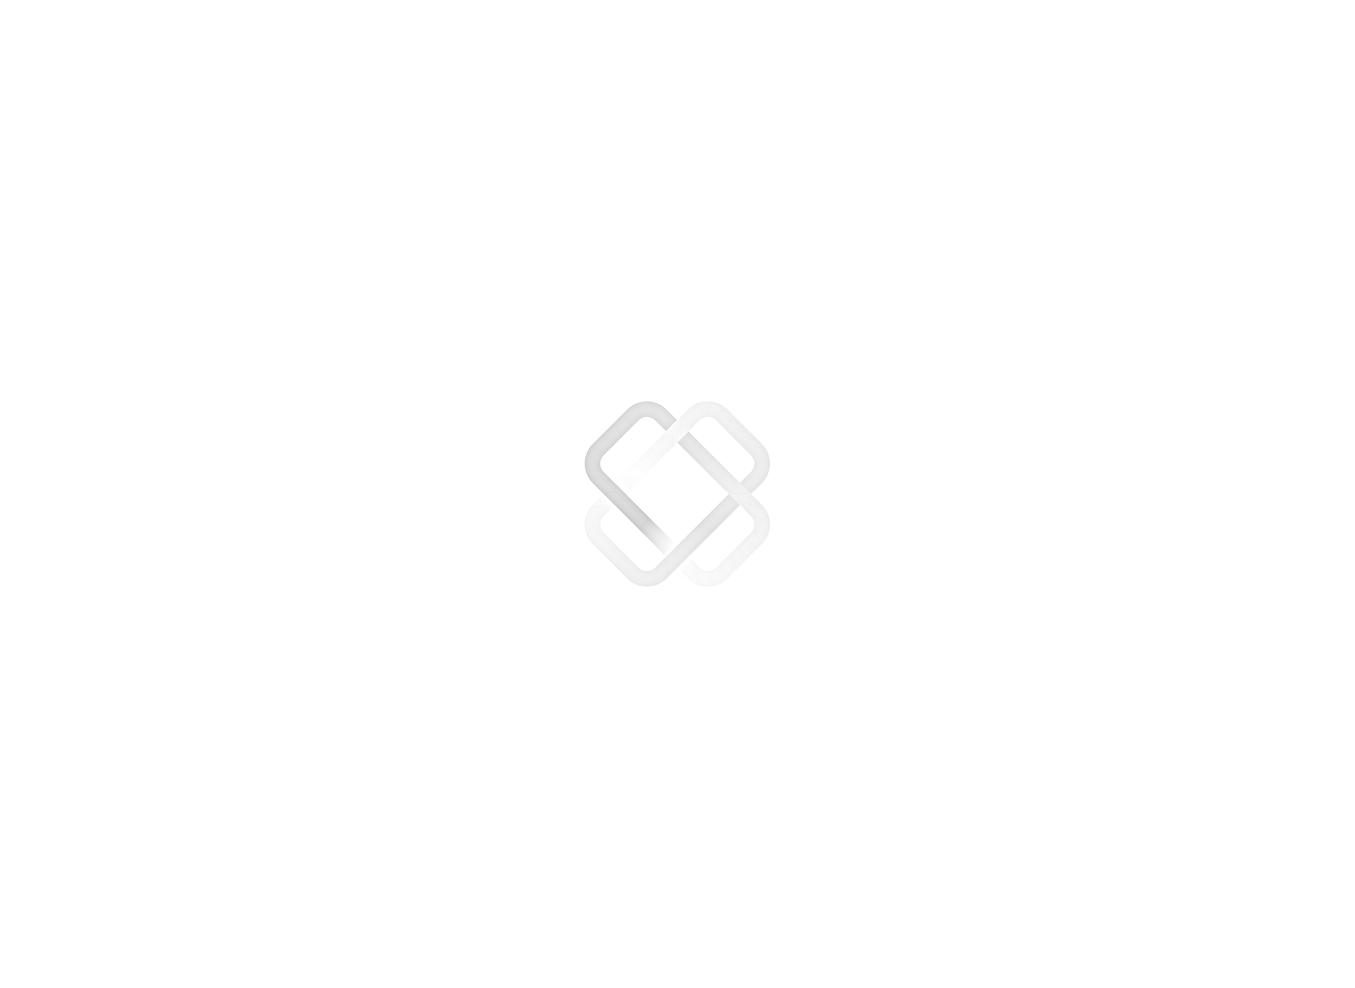 blockchain logo background white.png